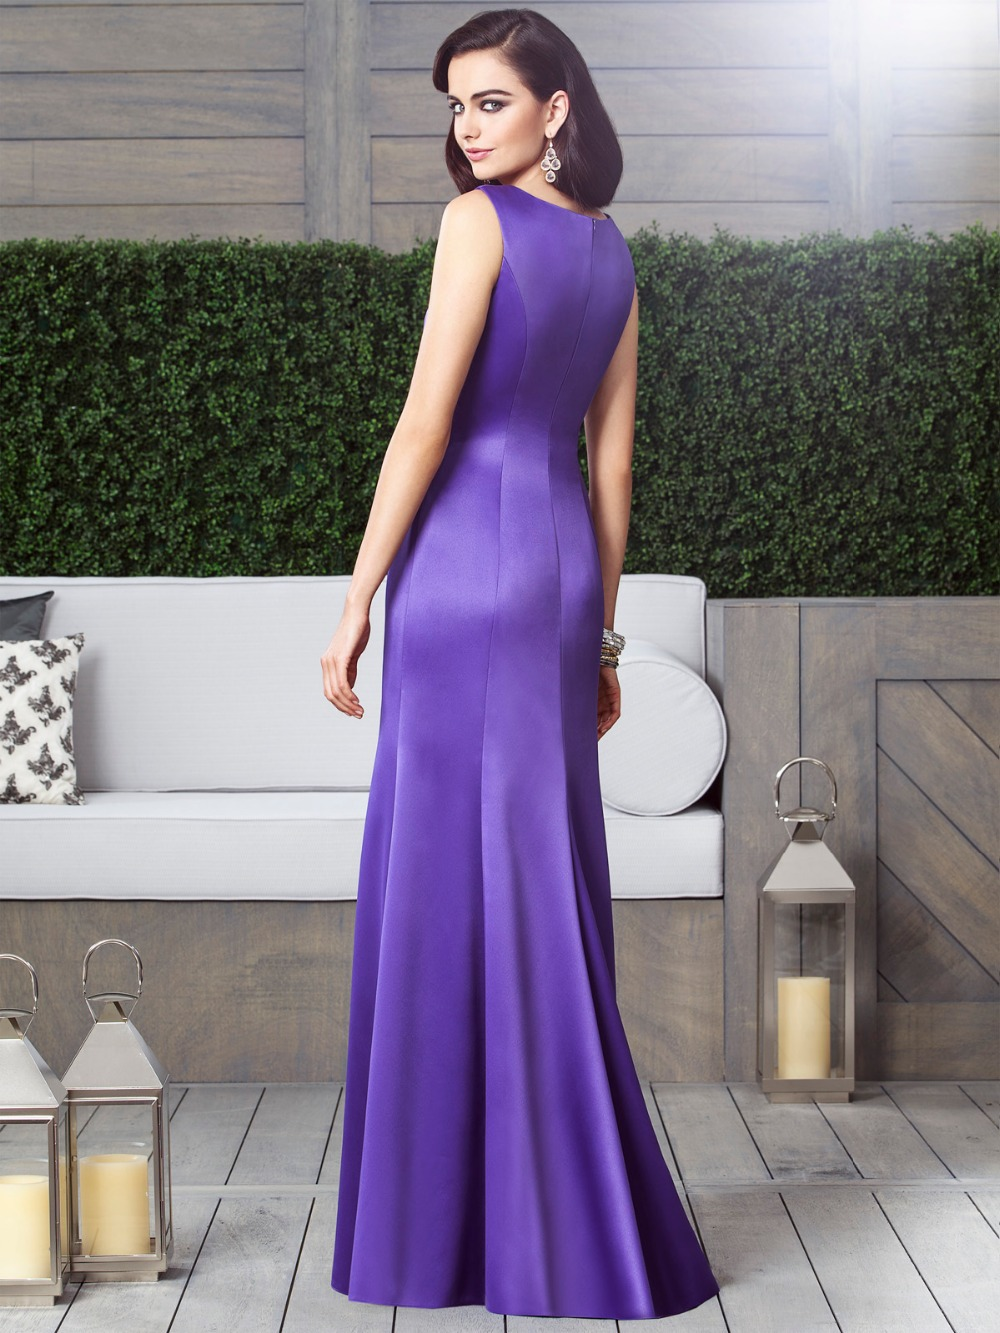 Fantástico Vestidos De época Para Damas Motivo - Ideas de Vestidos ...